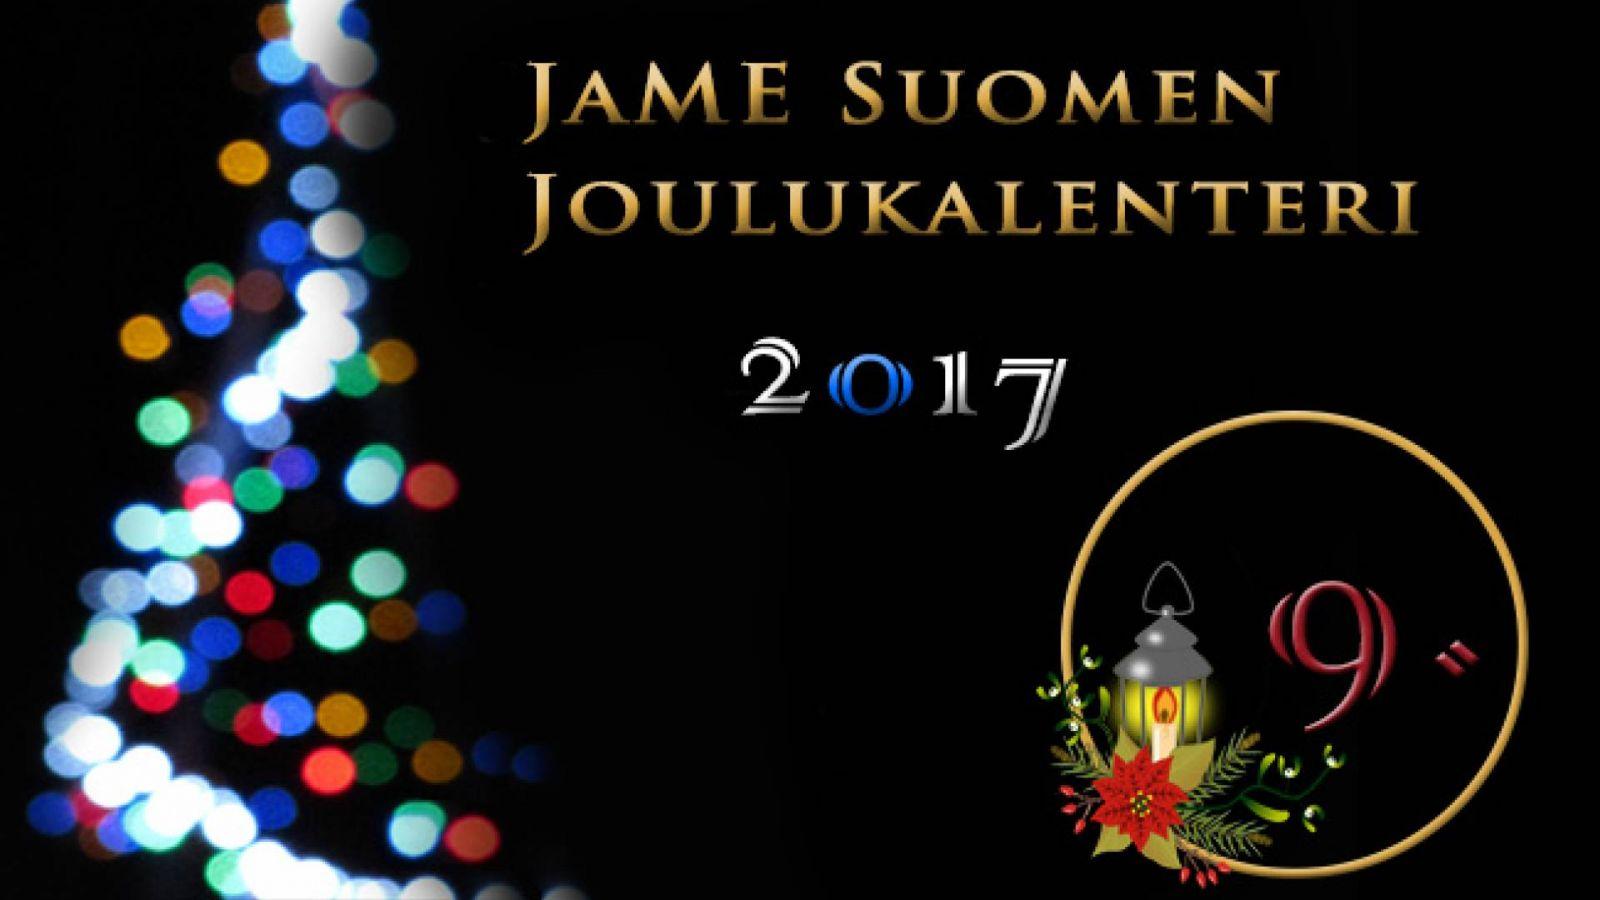 JaME Suomen joulukalenterin 9. luukku © Nipsu